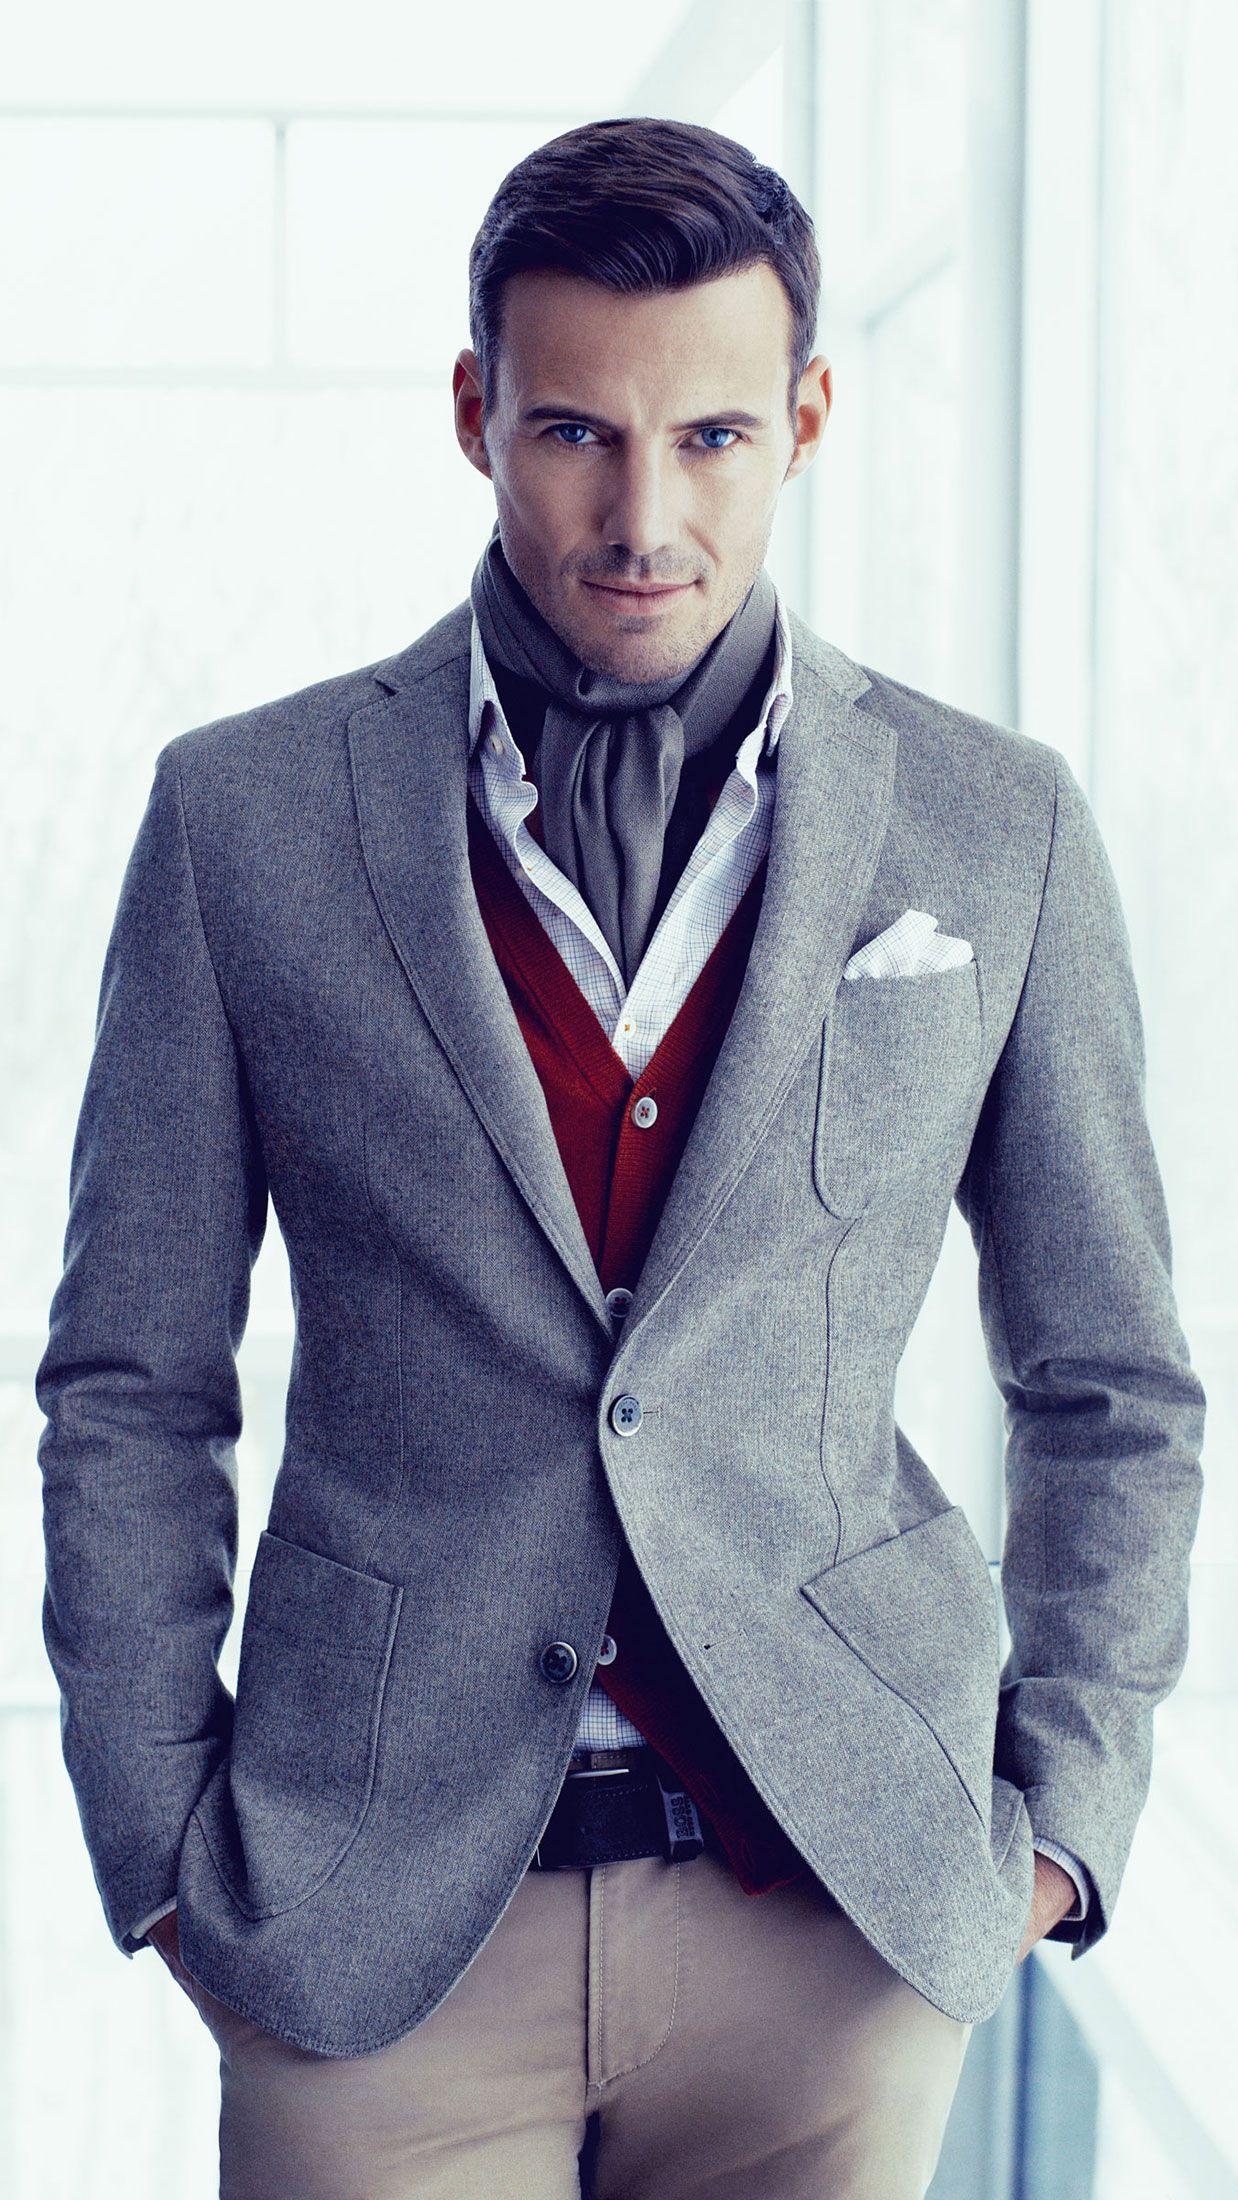 style vestimentaire traditionnel, homme, look, pochette, veste, ceinture,  gilet, foulard 115594be155